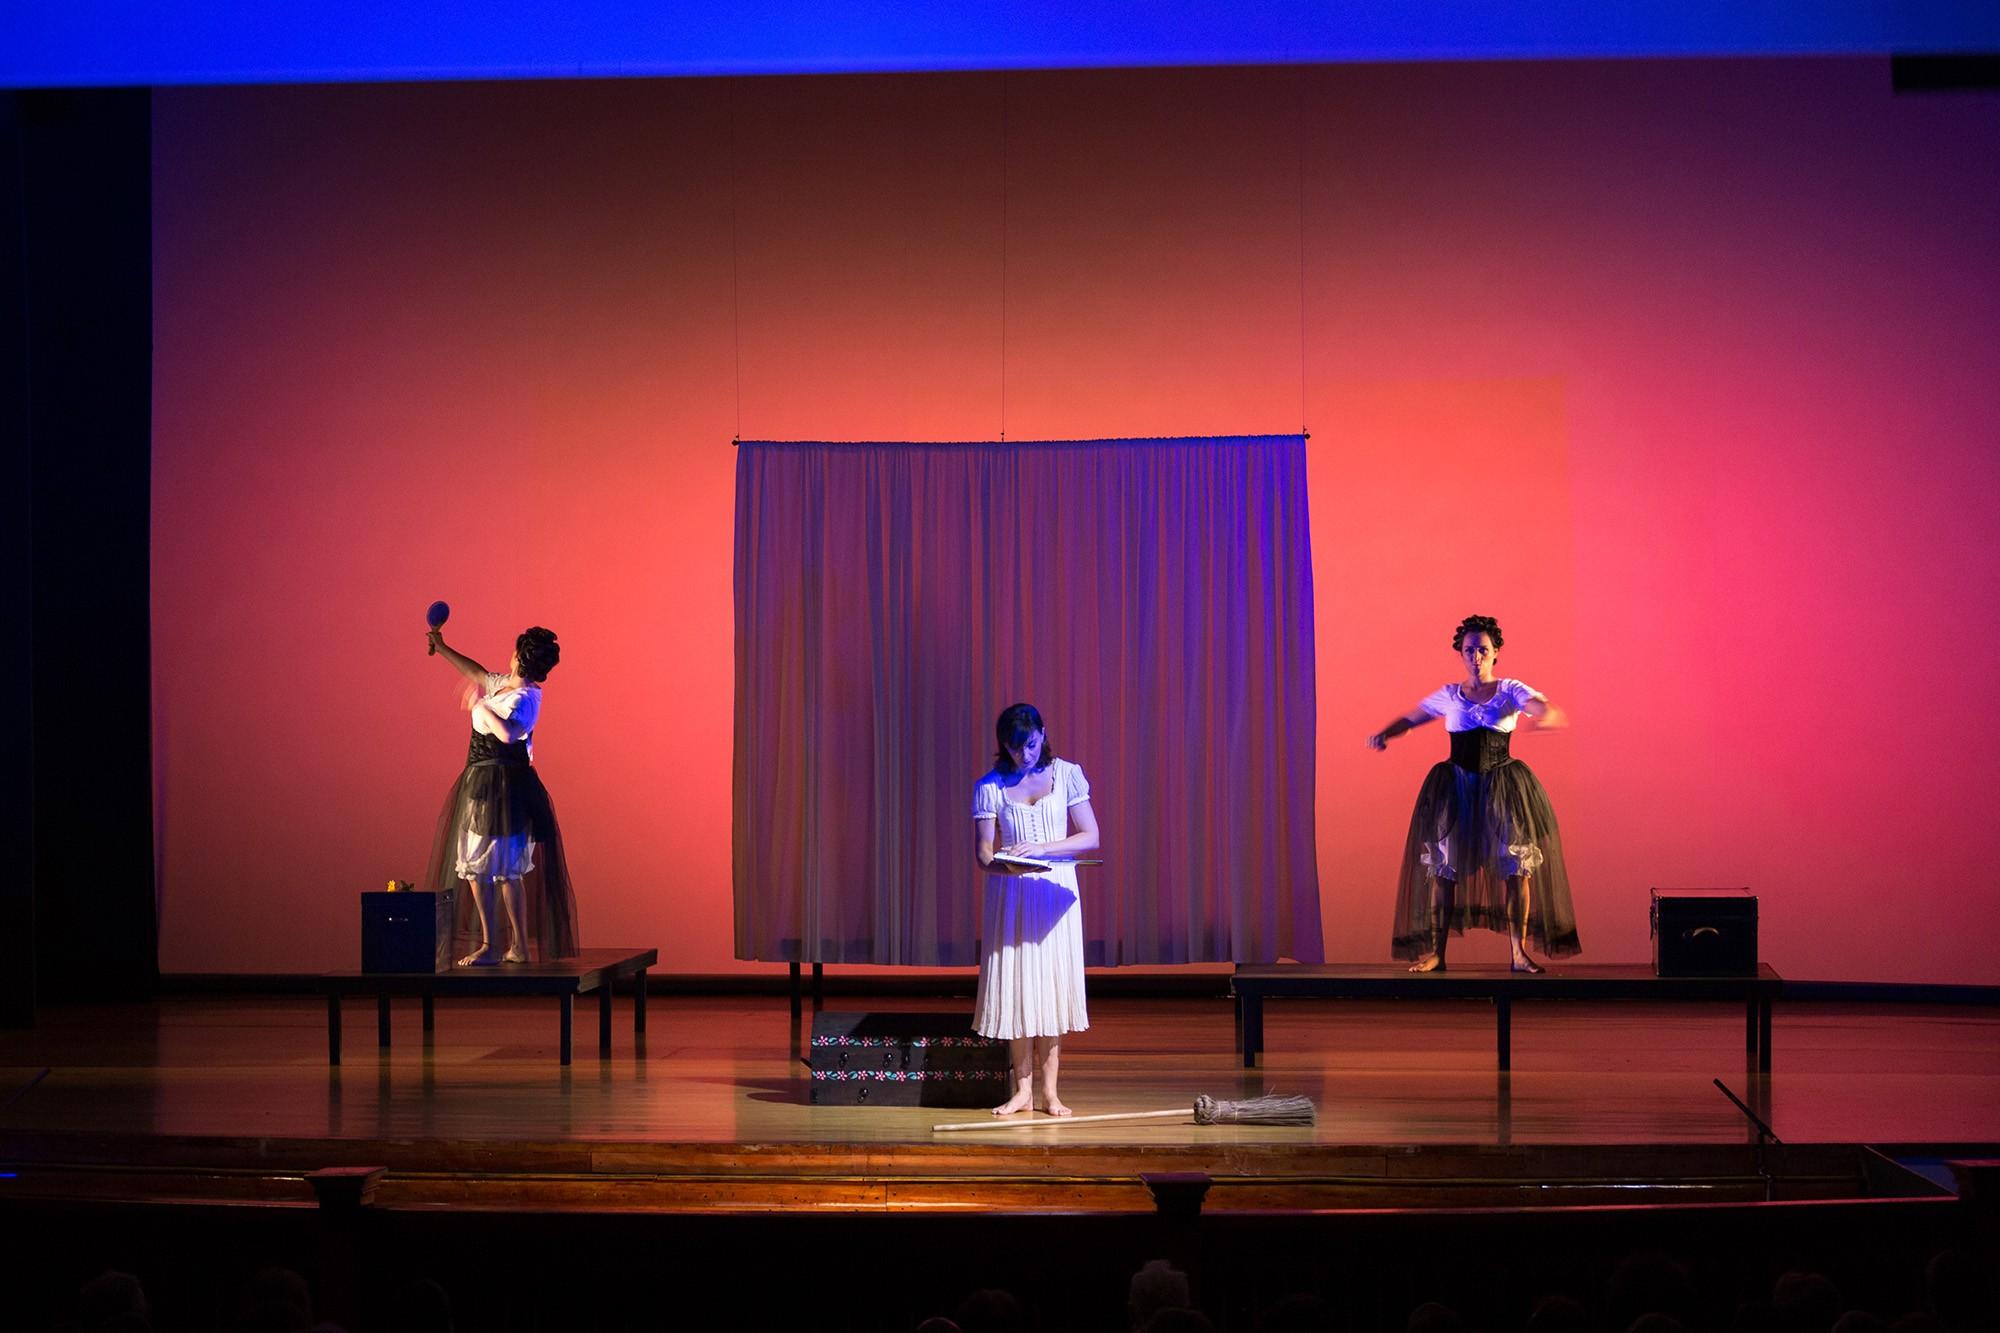 Cenerentola-Opera-directed-by-Jacopo-Spirei-3